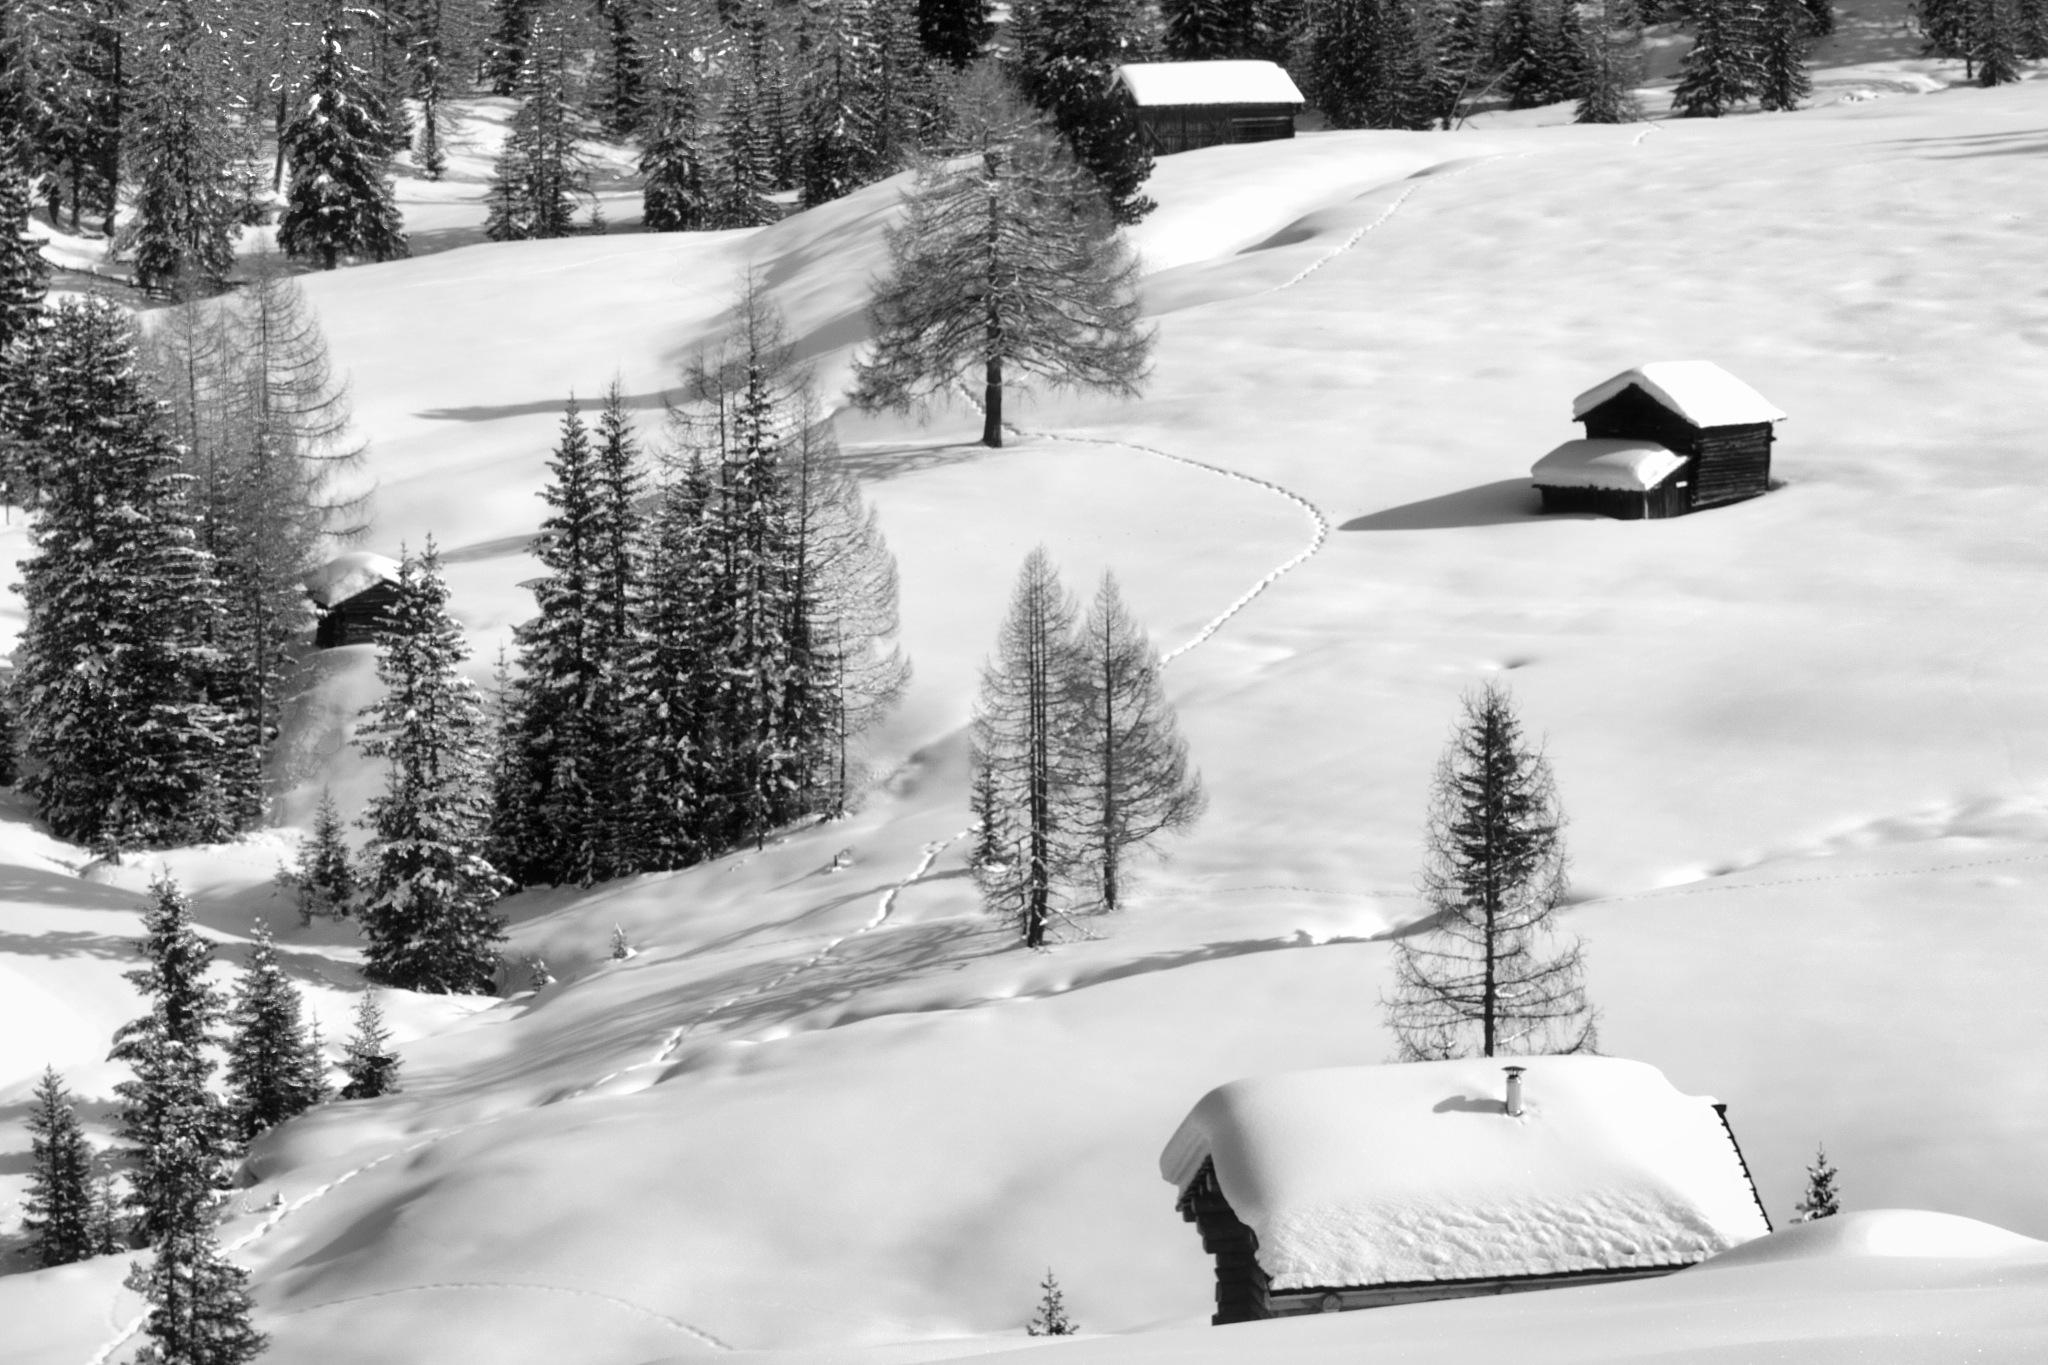 I Prati dell'Armentara by MarkSoetebierVideophotography